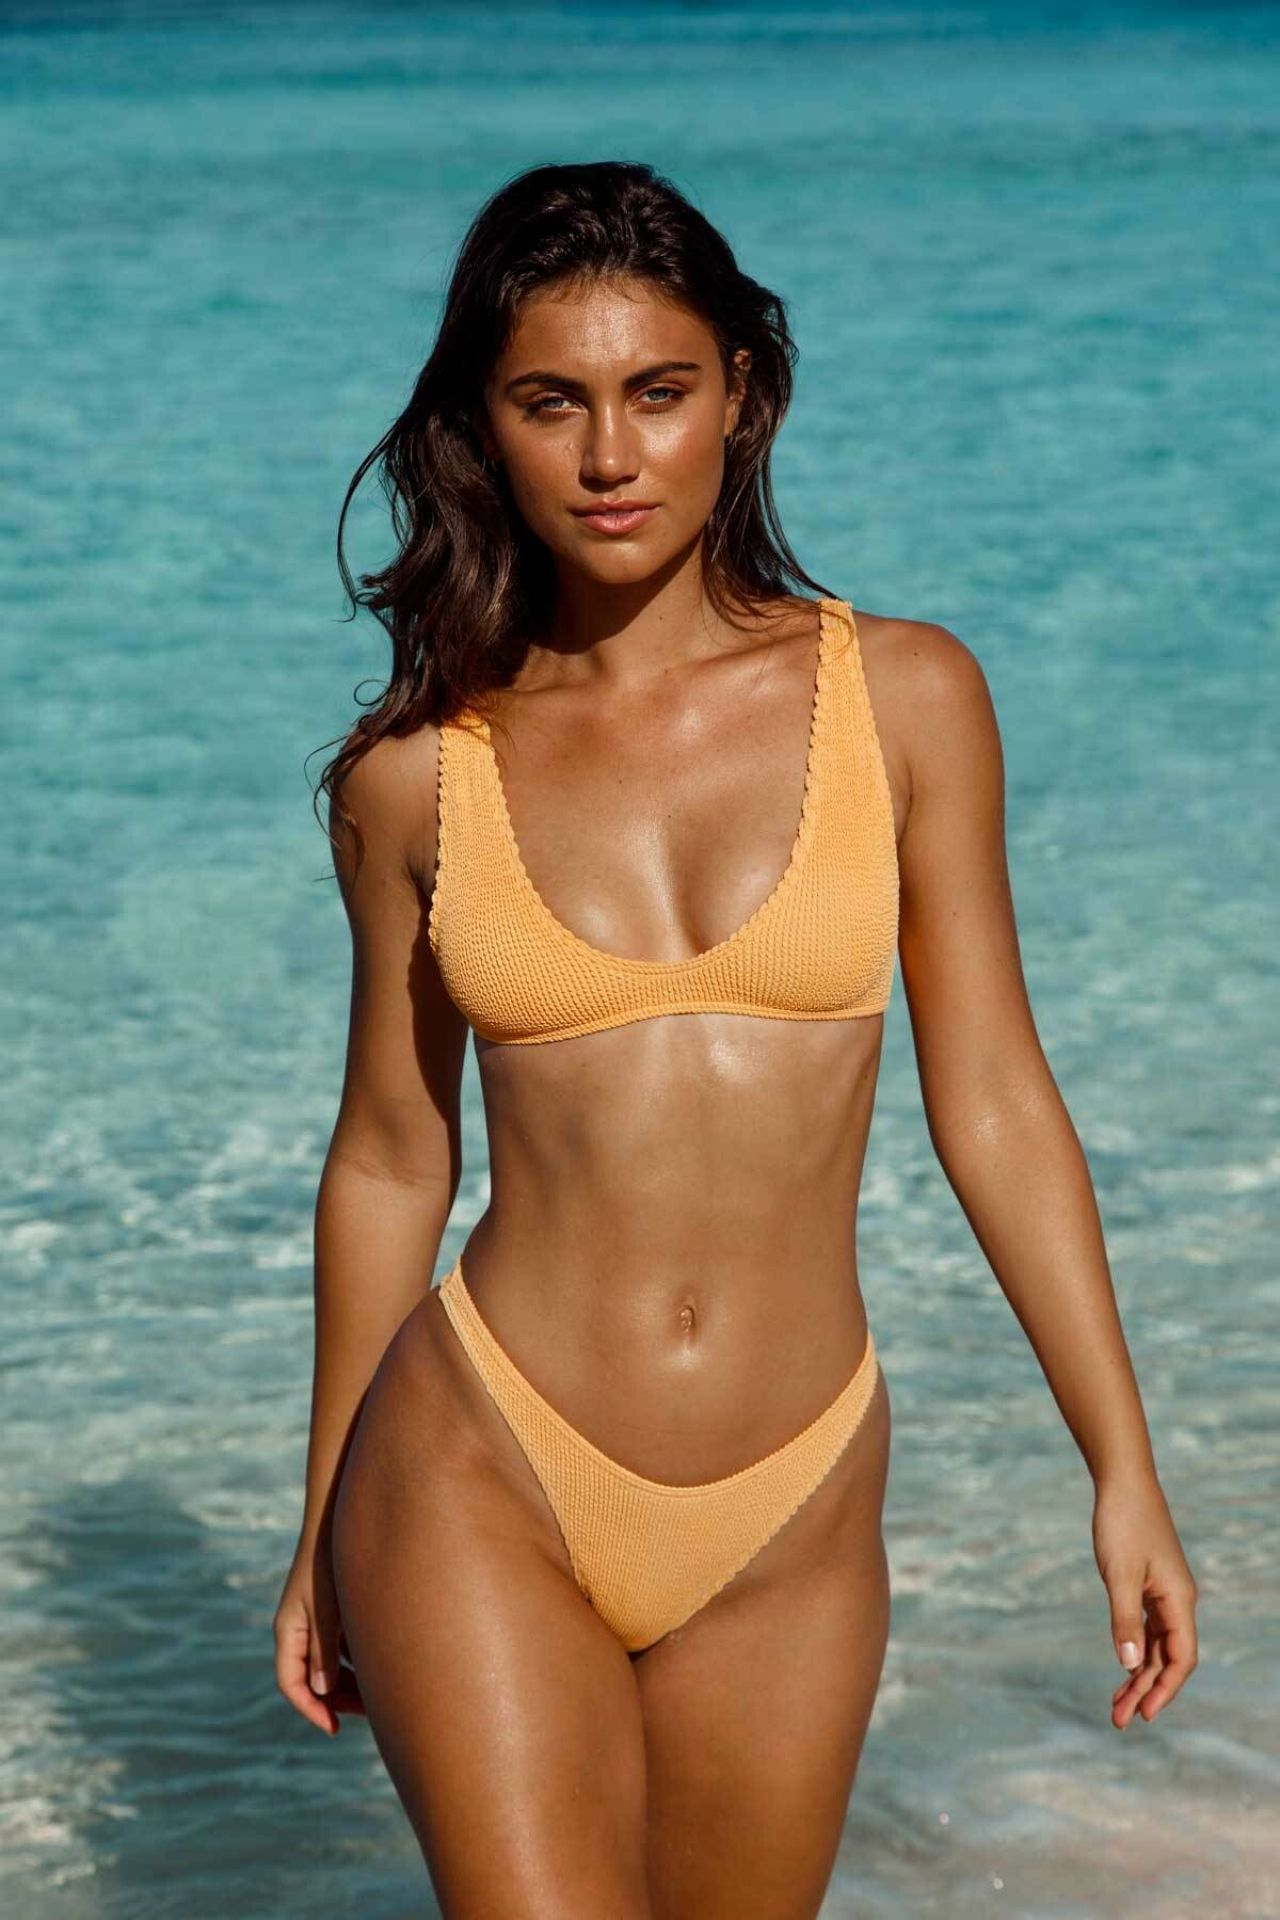 Bikini tessa thompson Janelle Monae